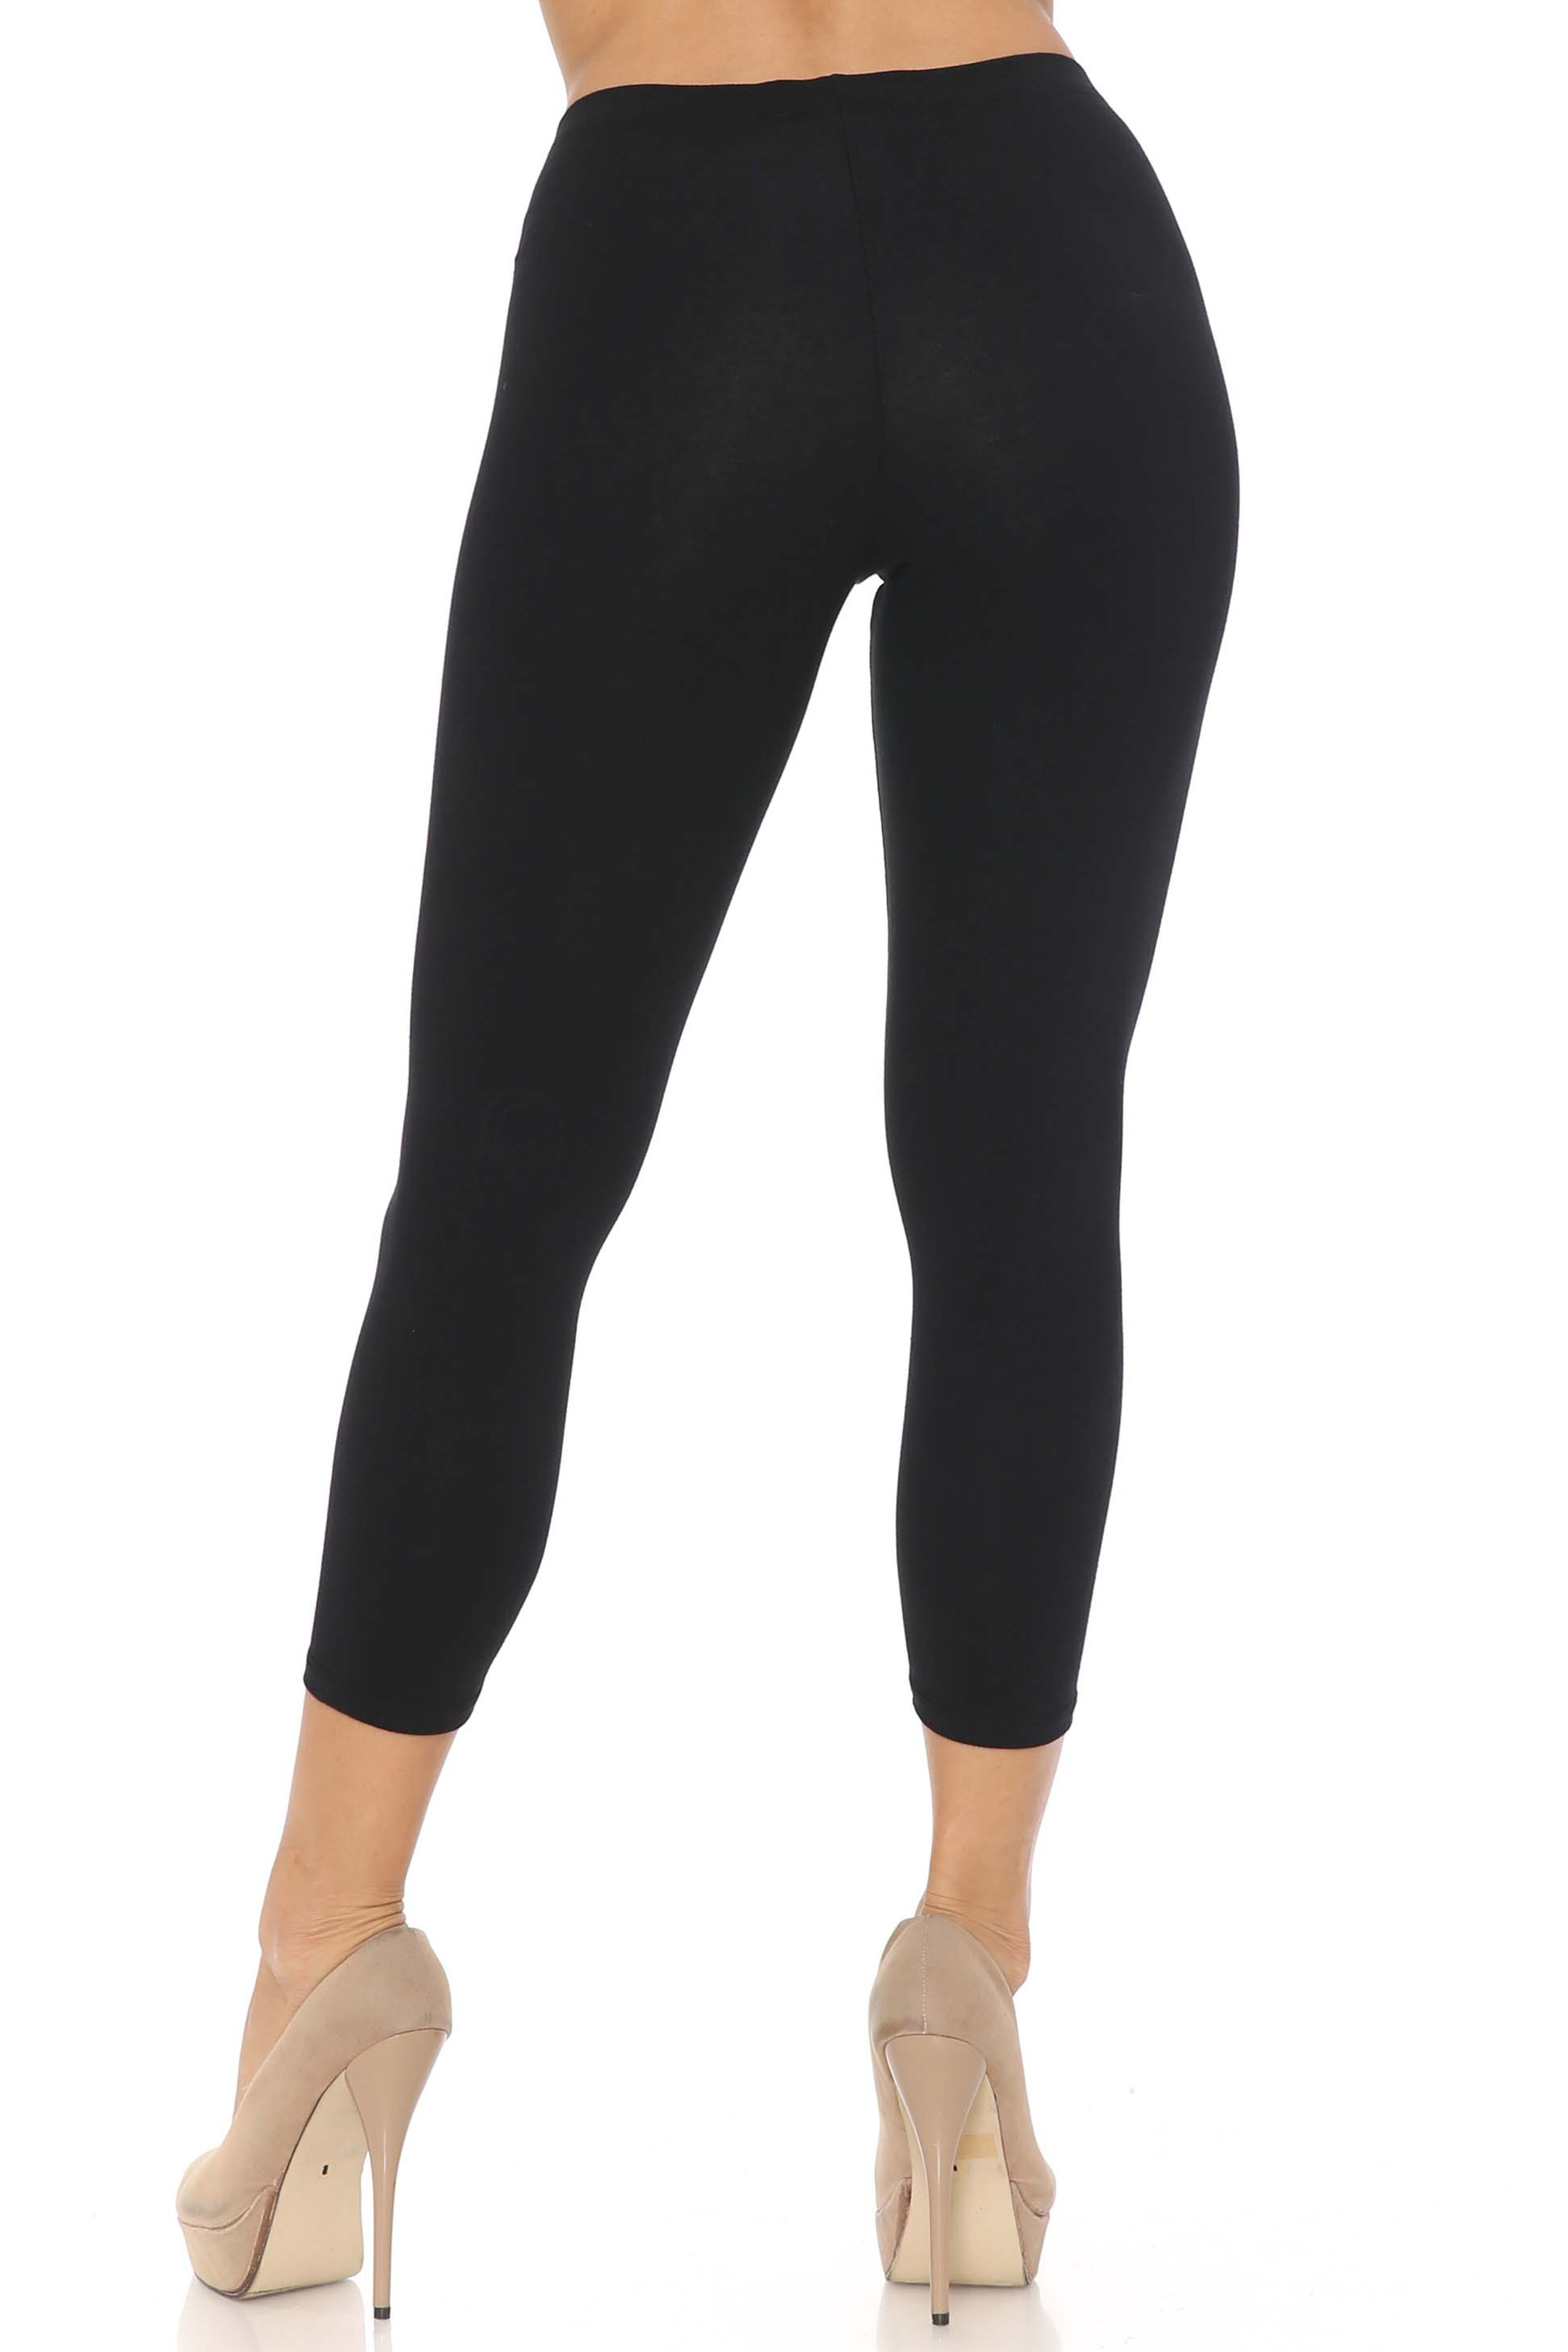 Rear view image of black USA Cotton Capri Length Leggings